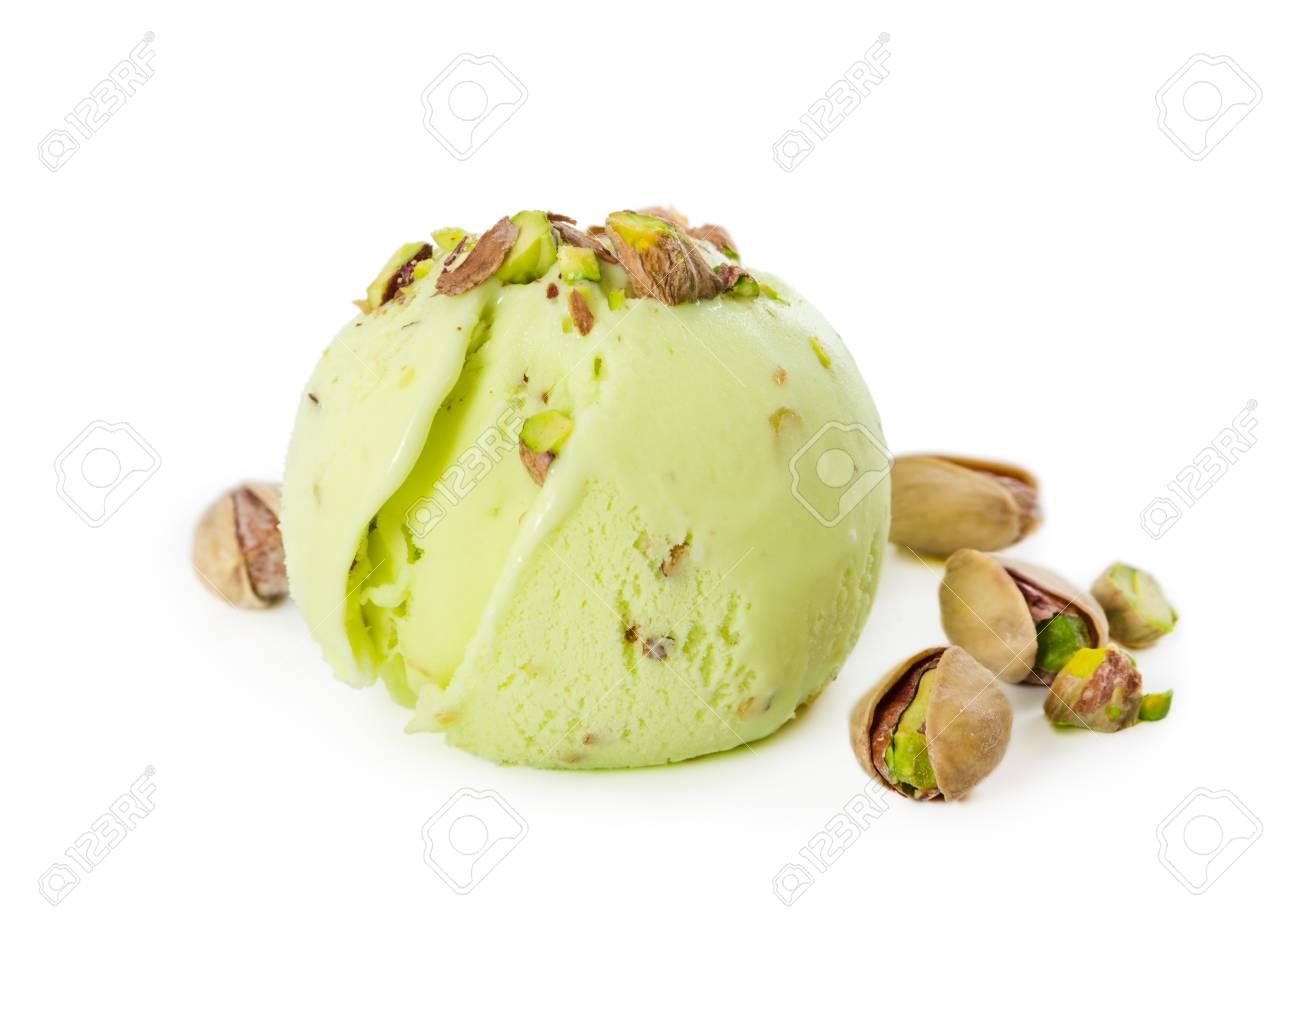 Scoop of pistachio ice cream with pistachios isolated on white background - 102523654